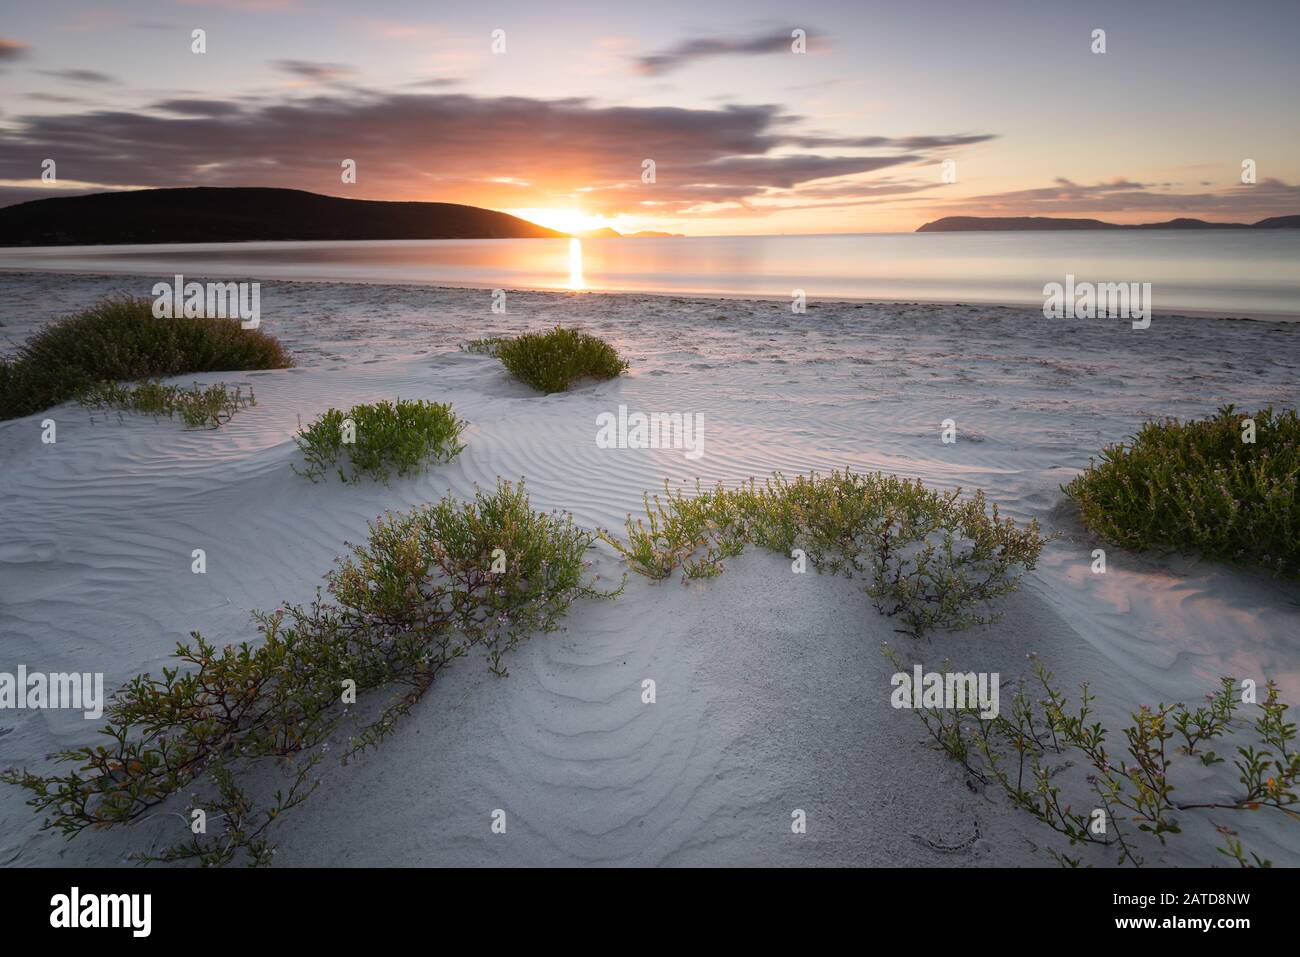 Emu Point at sunrise, Albany, Western Australia, Australia Stock Photo